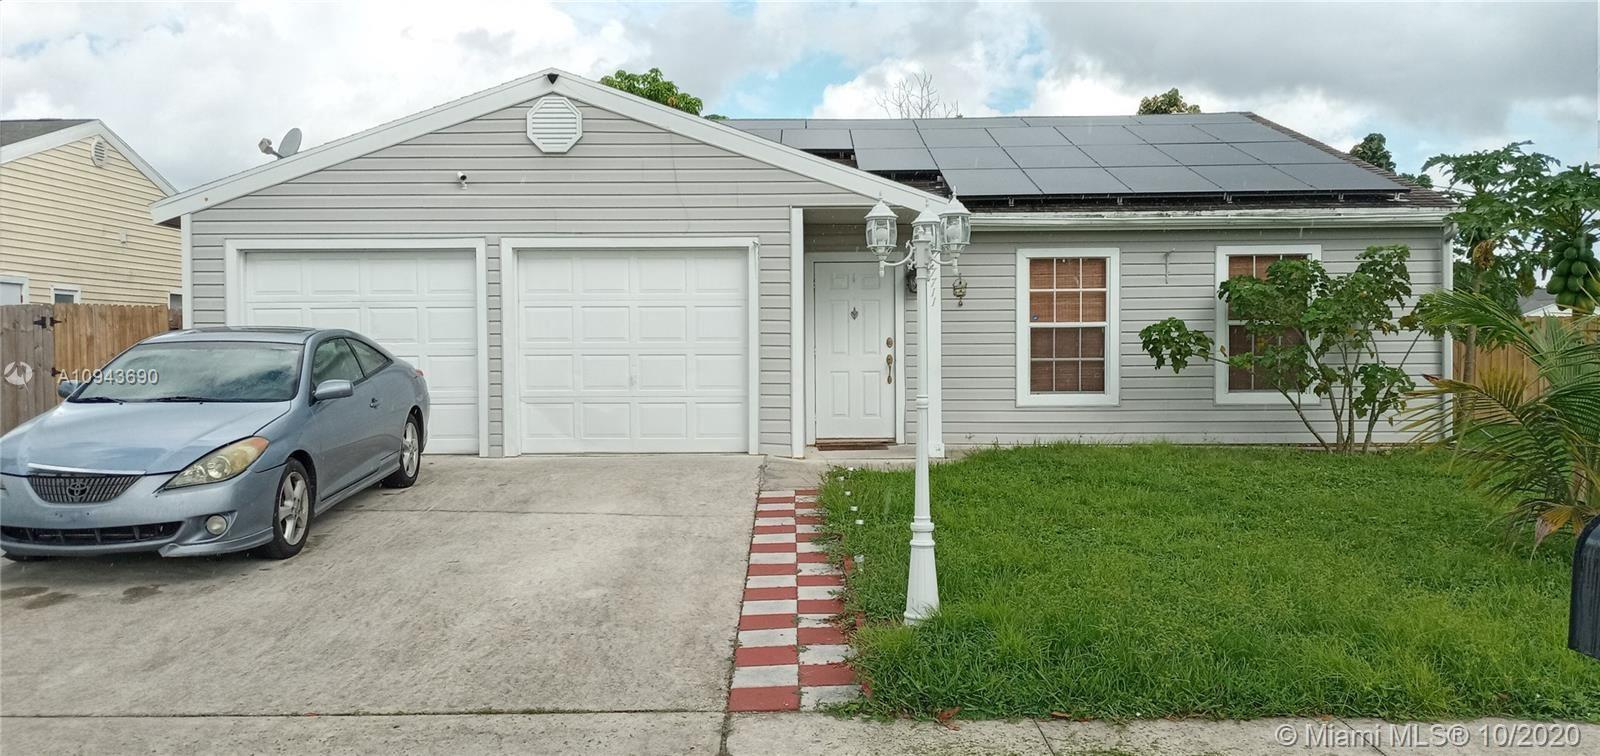 7711 Ashwood Ln, Lake Worth, FL 33467 - #: A10943690